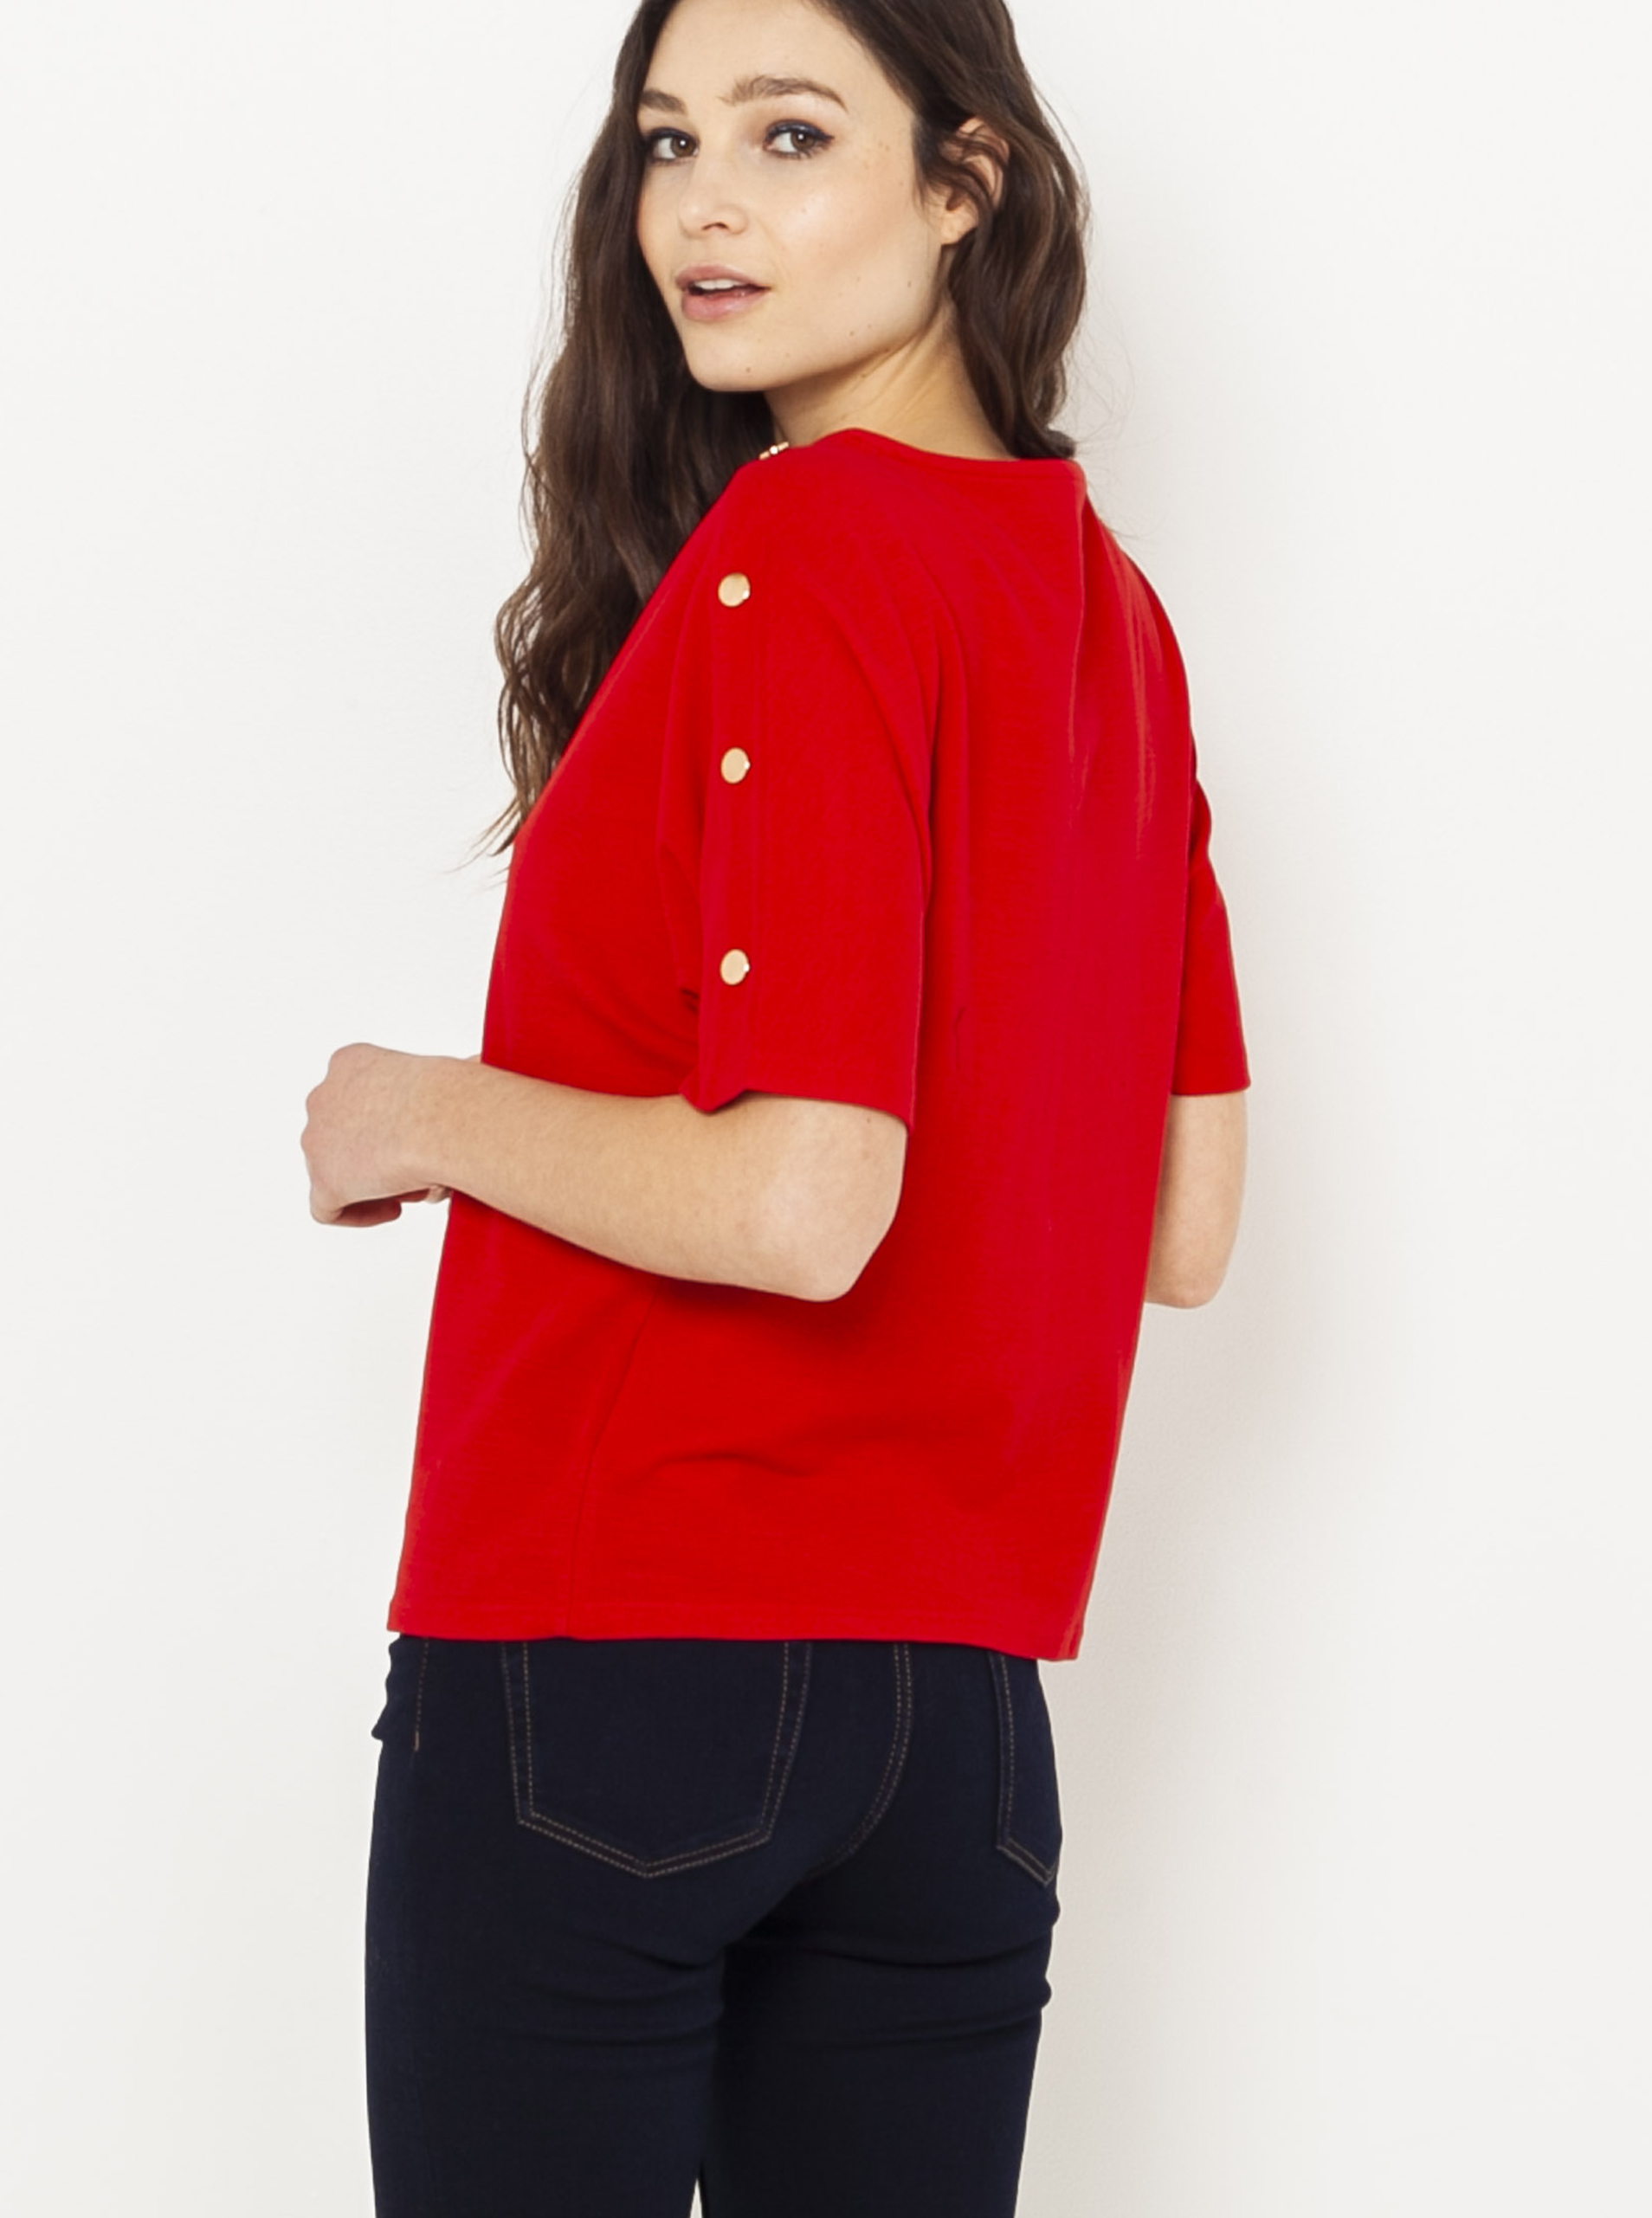 Červené tričko s ozdobnými knoflíky na rukávech CAMAIEU